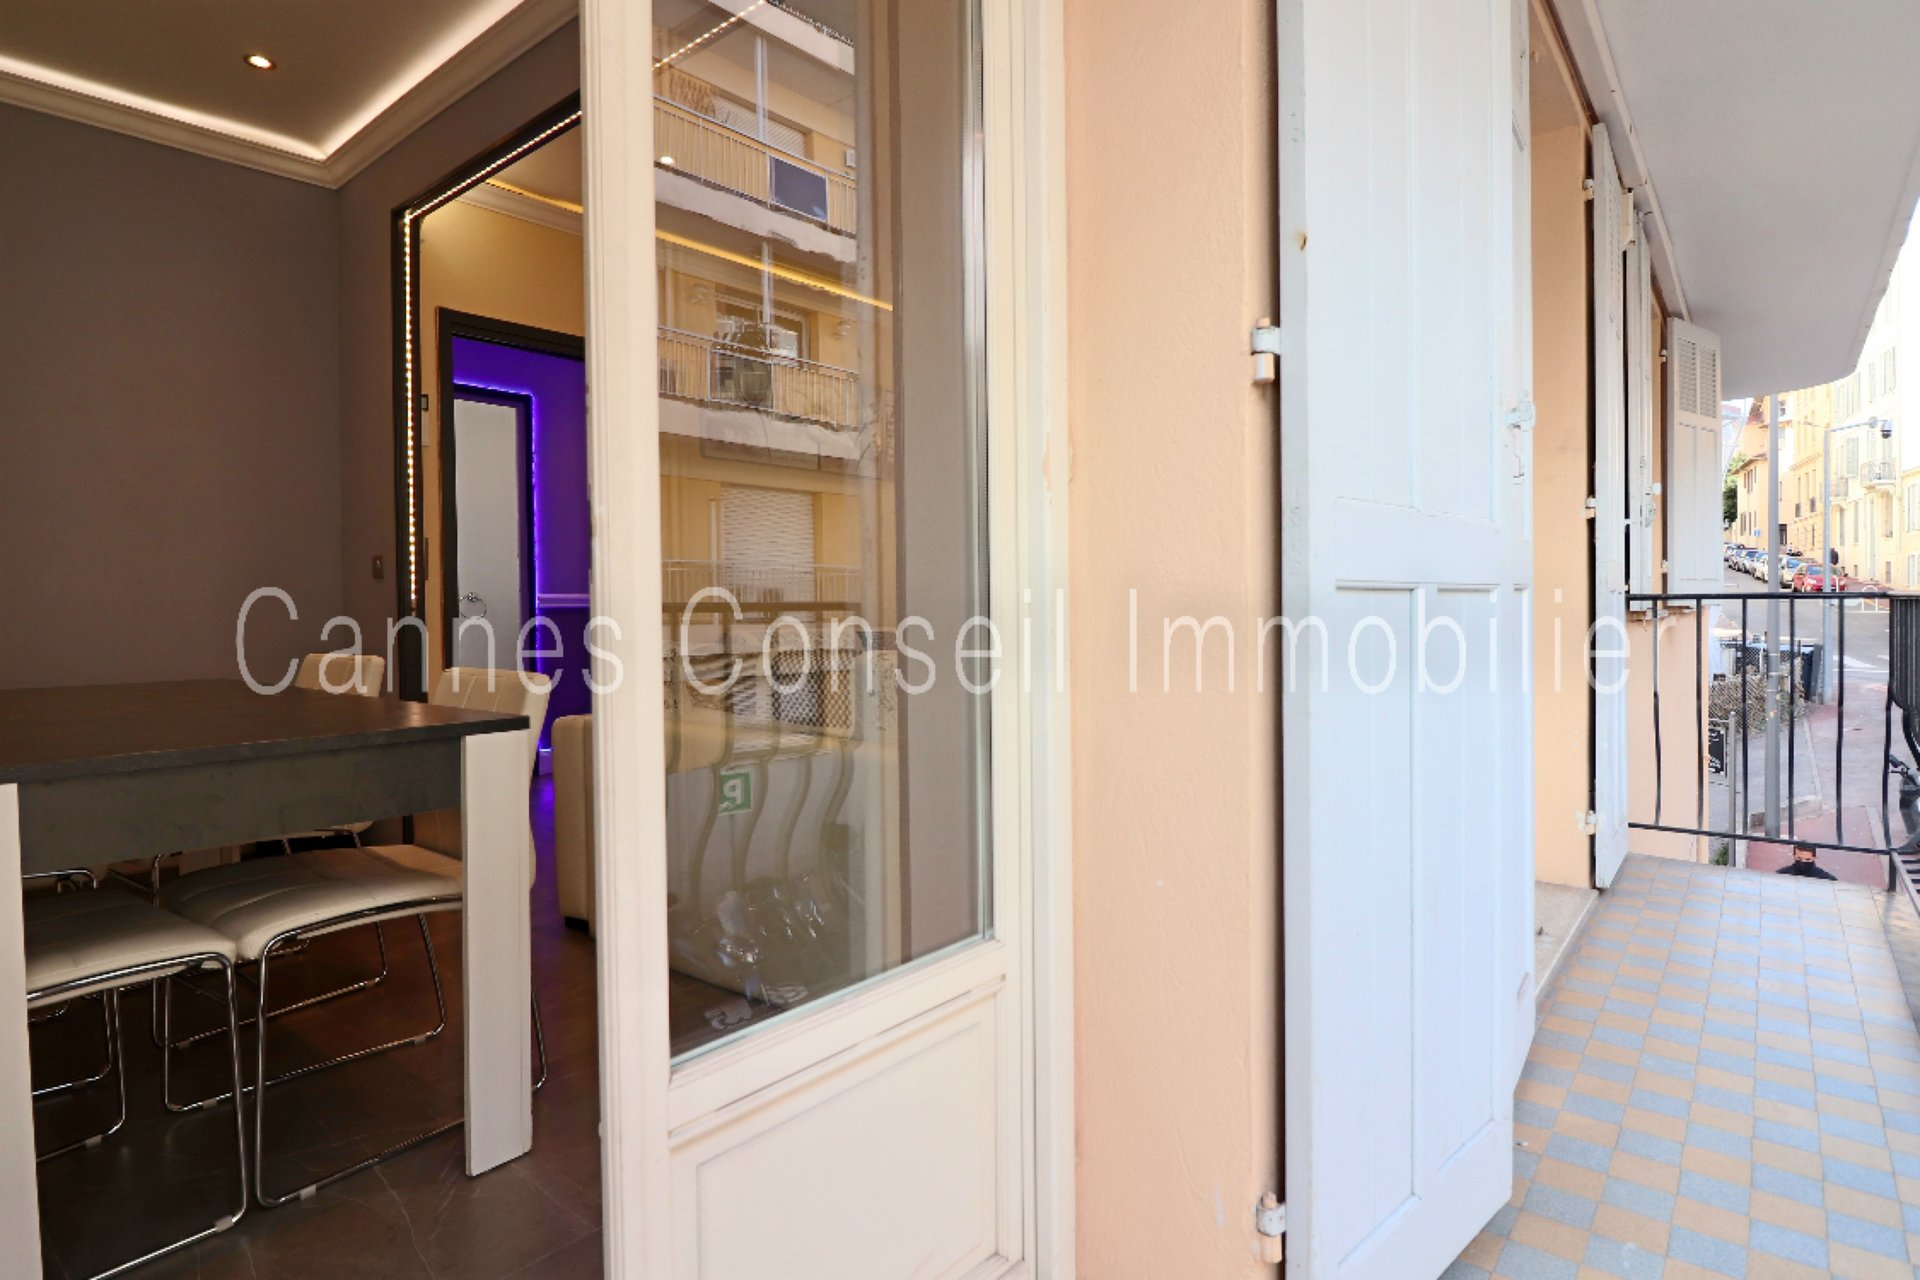 Cannes Gallieni - 3P modern